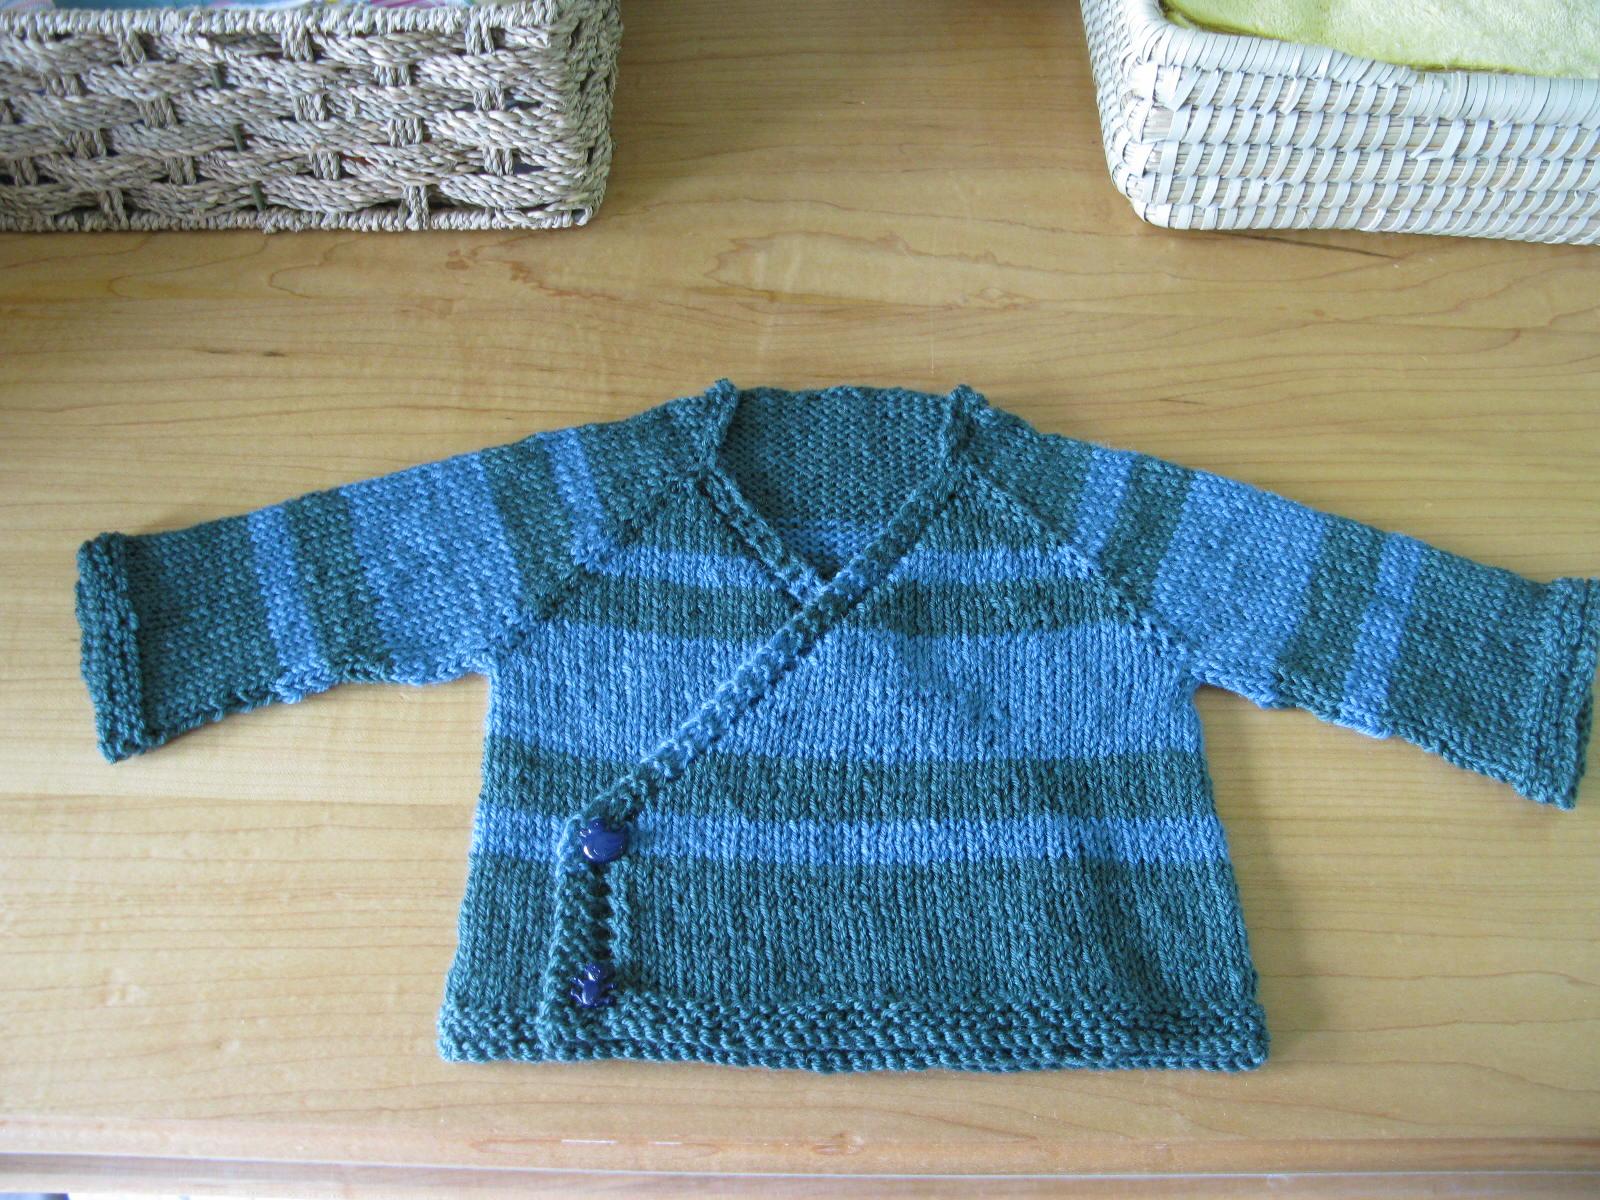 Knitting Pattern For Kimono Wrap : On Urges and their Fulfillment.   Amfora.